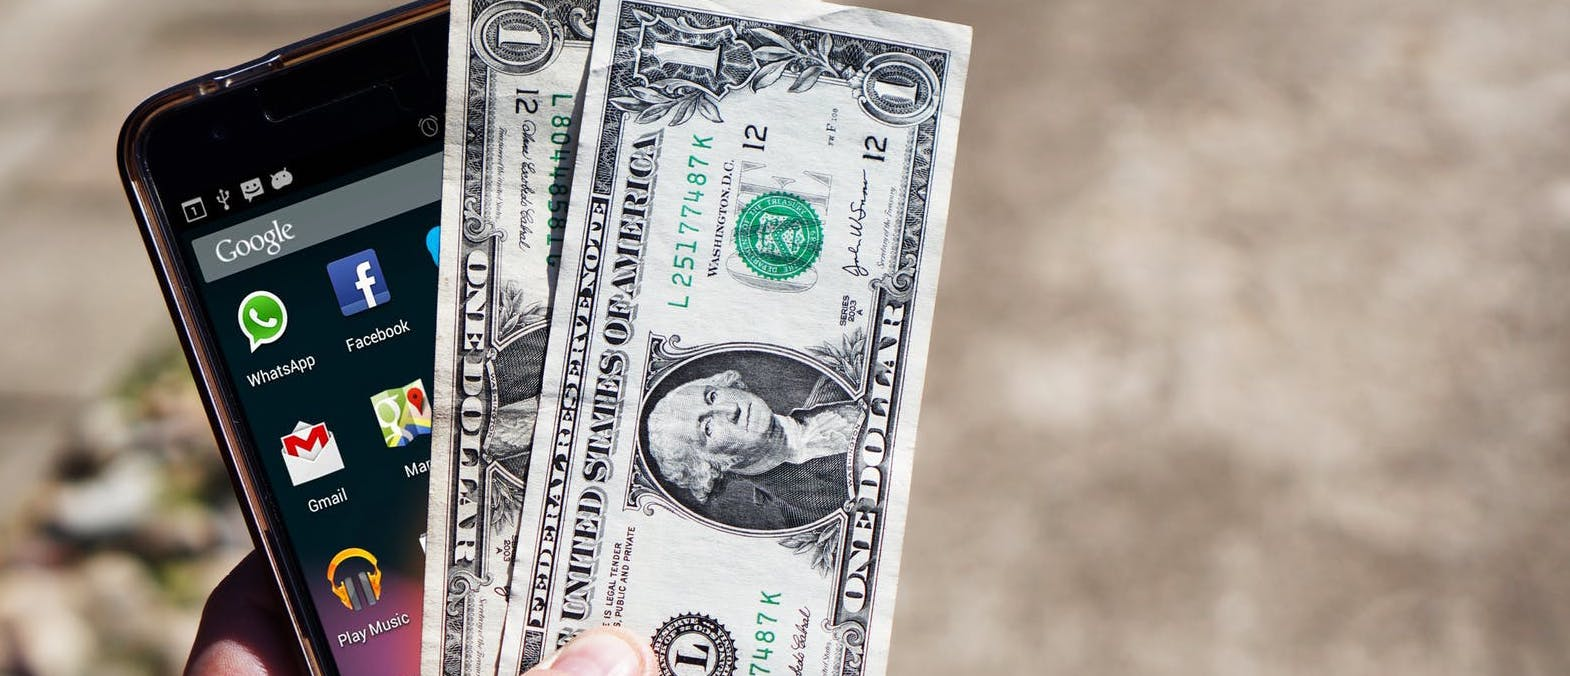 mobile-phone-money-banknotes-us-dollars-163069.jpg